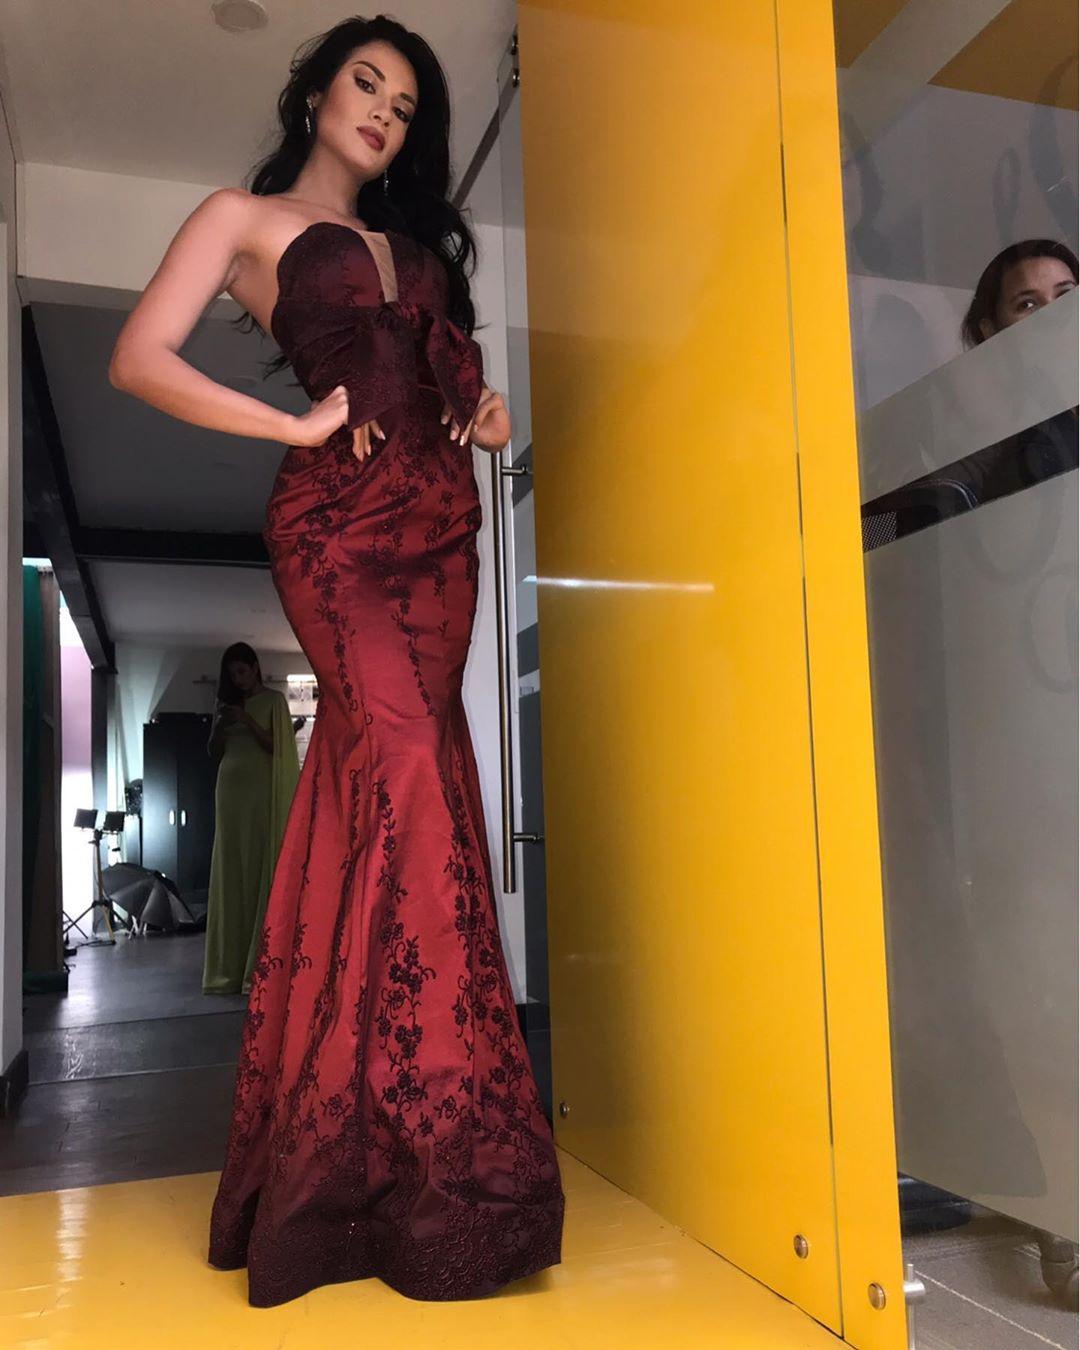 yenny katherine carrillo, top 20 de miss earth 2019/reyna mundial banano 2017. - Página 4 69435510